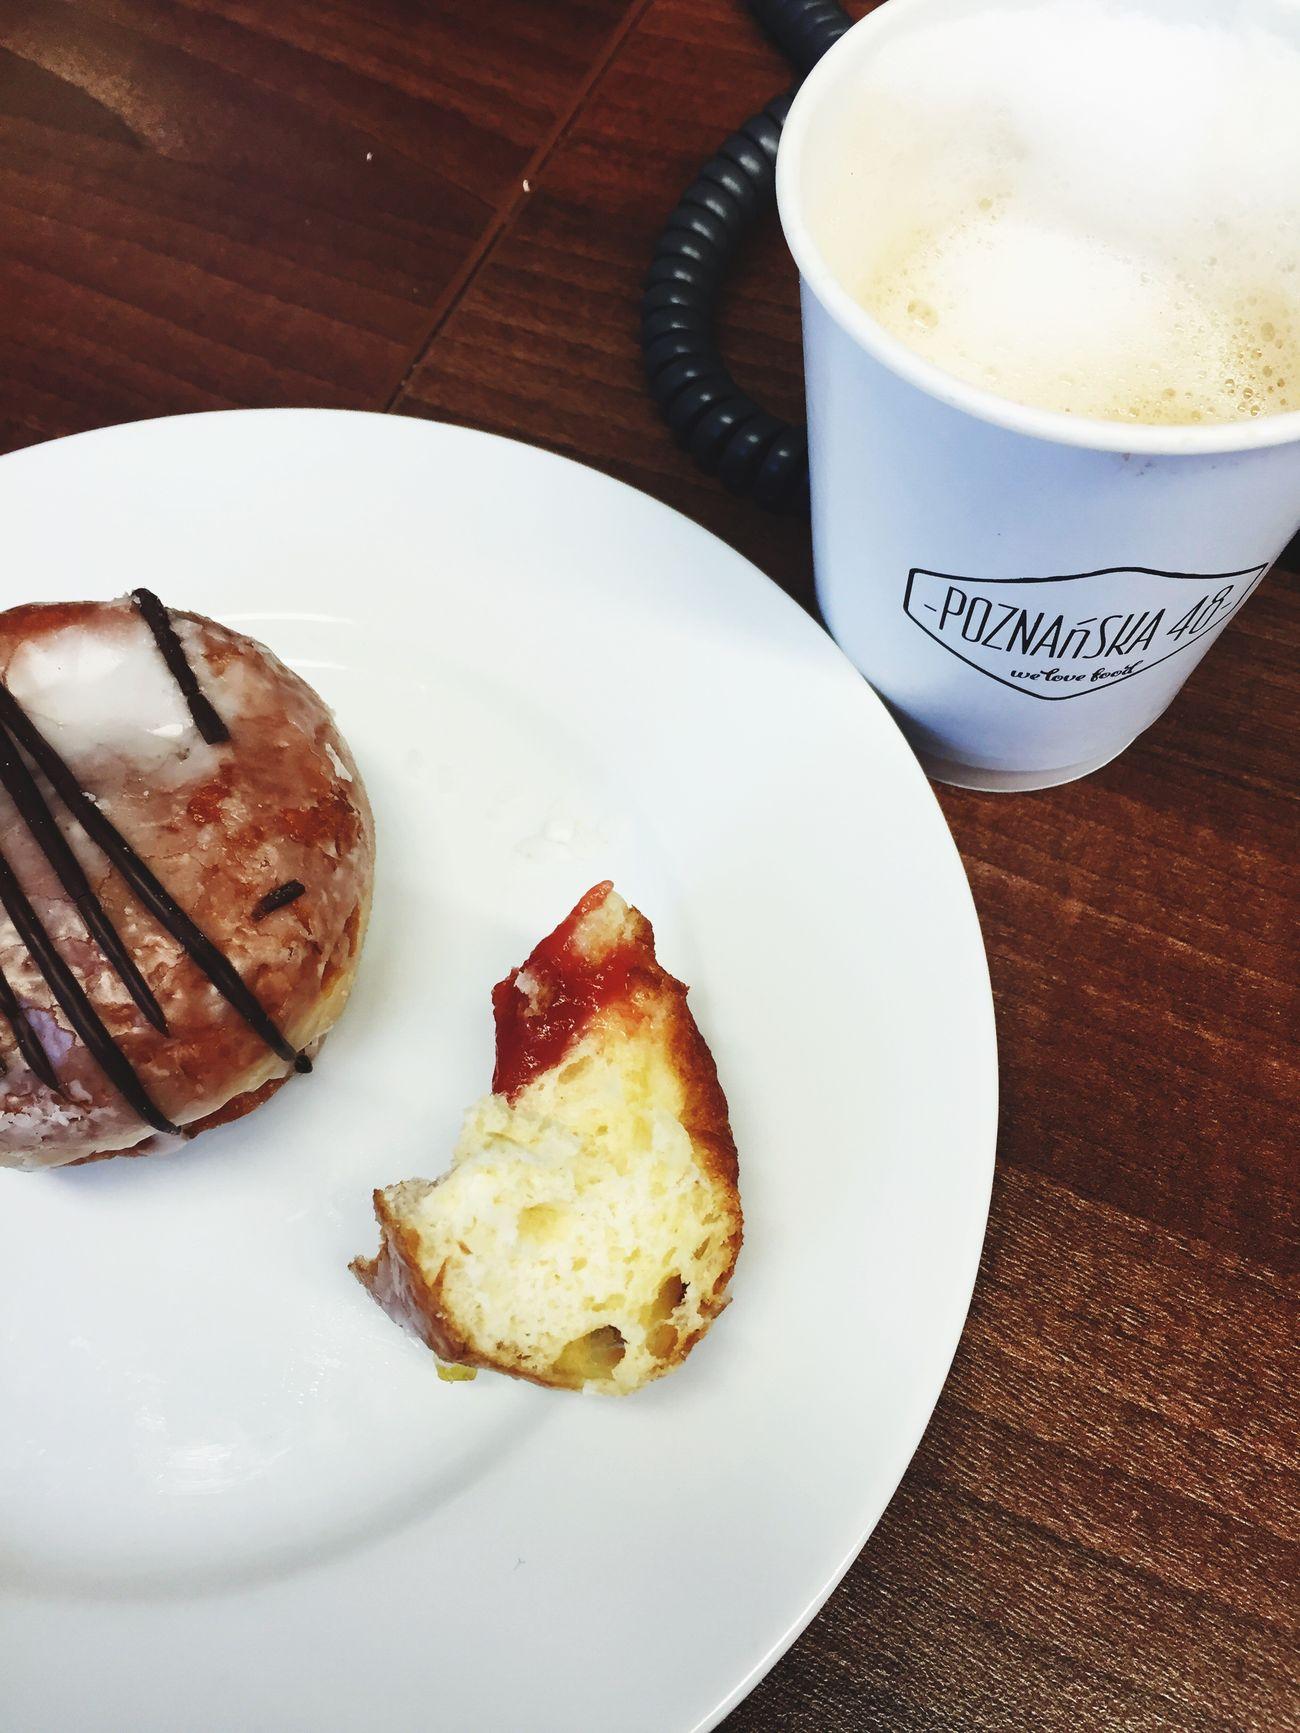 Tlustyczwartek Breakfast ♥ Pączusie